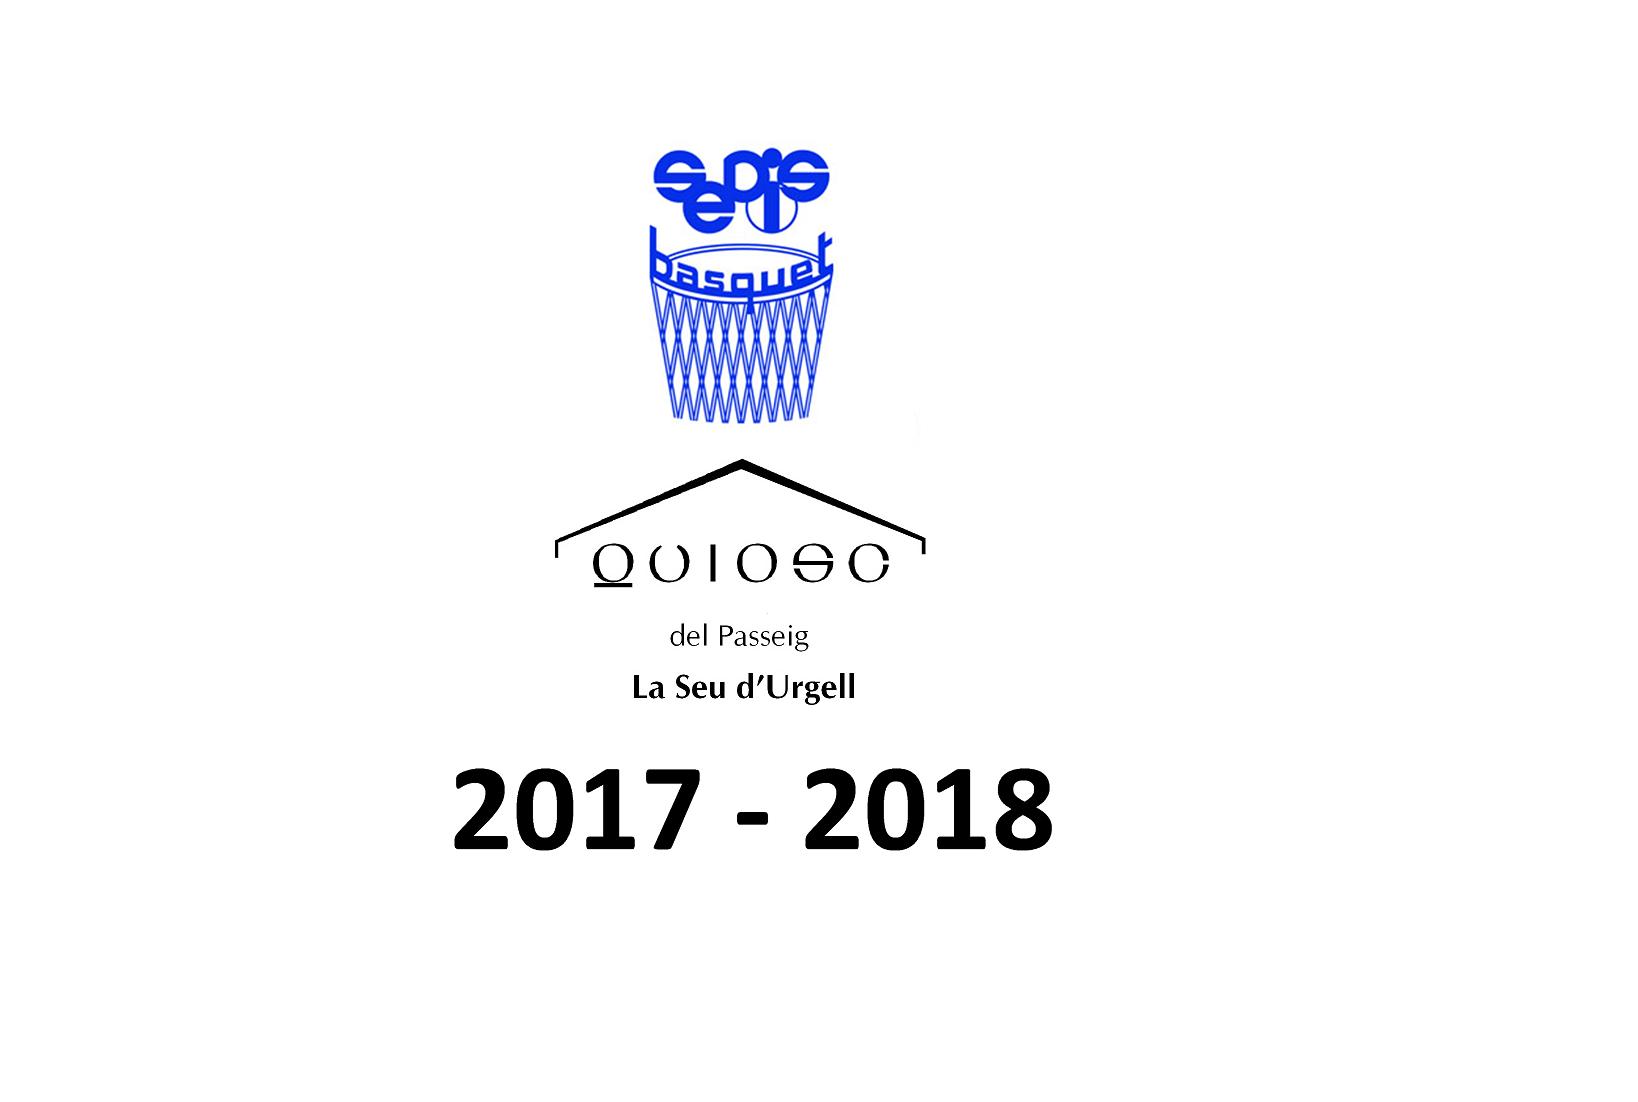 SEDIS EL QUIOSC 2017/2018